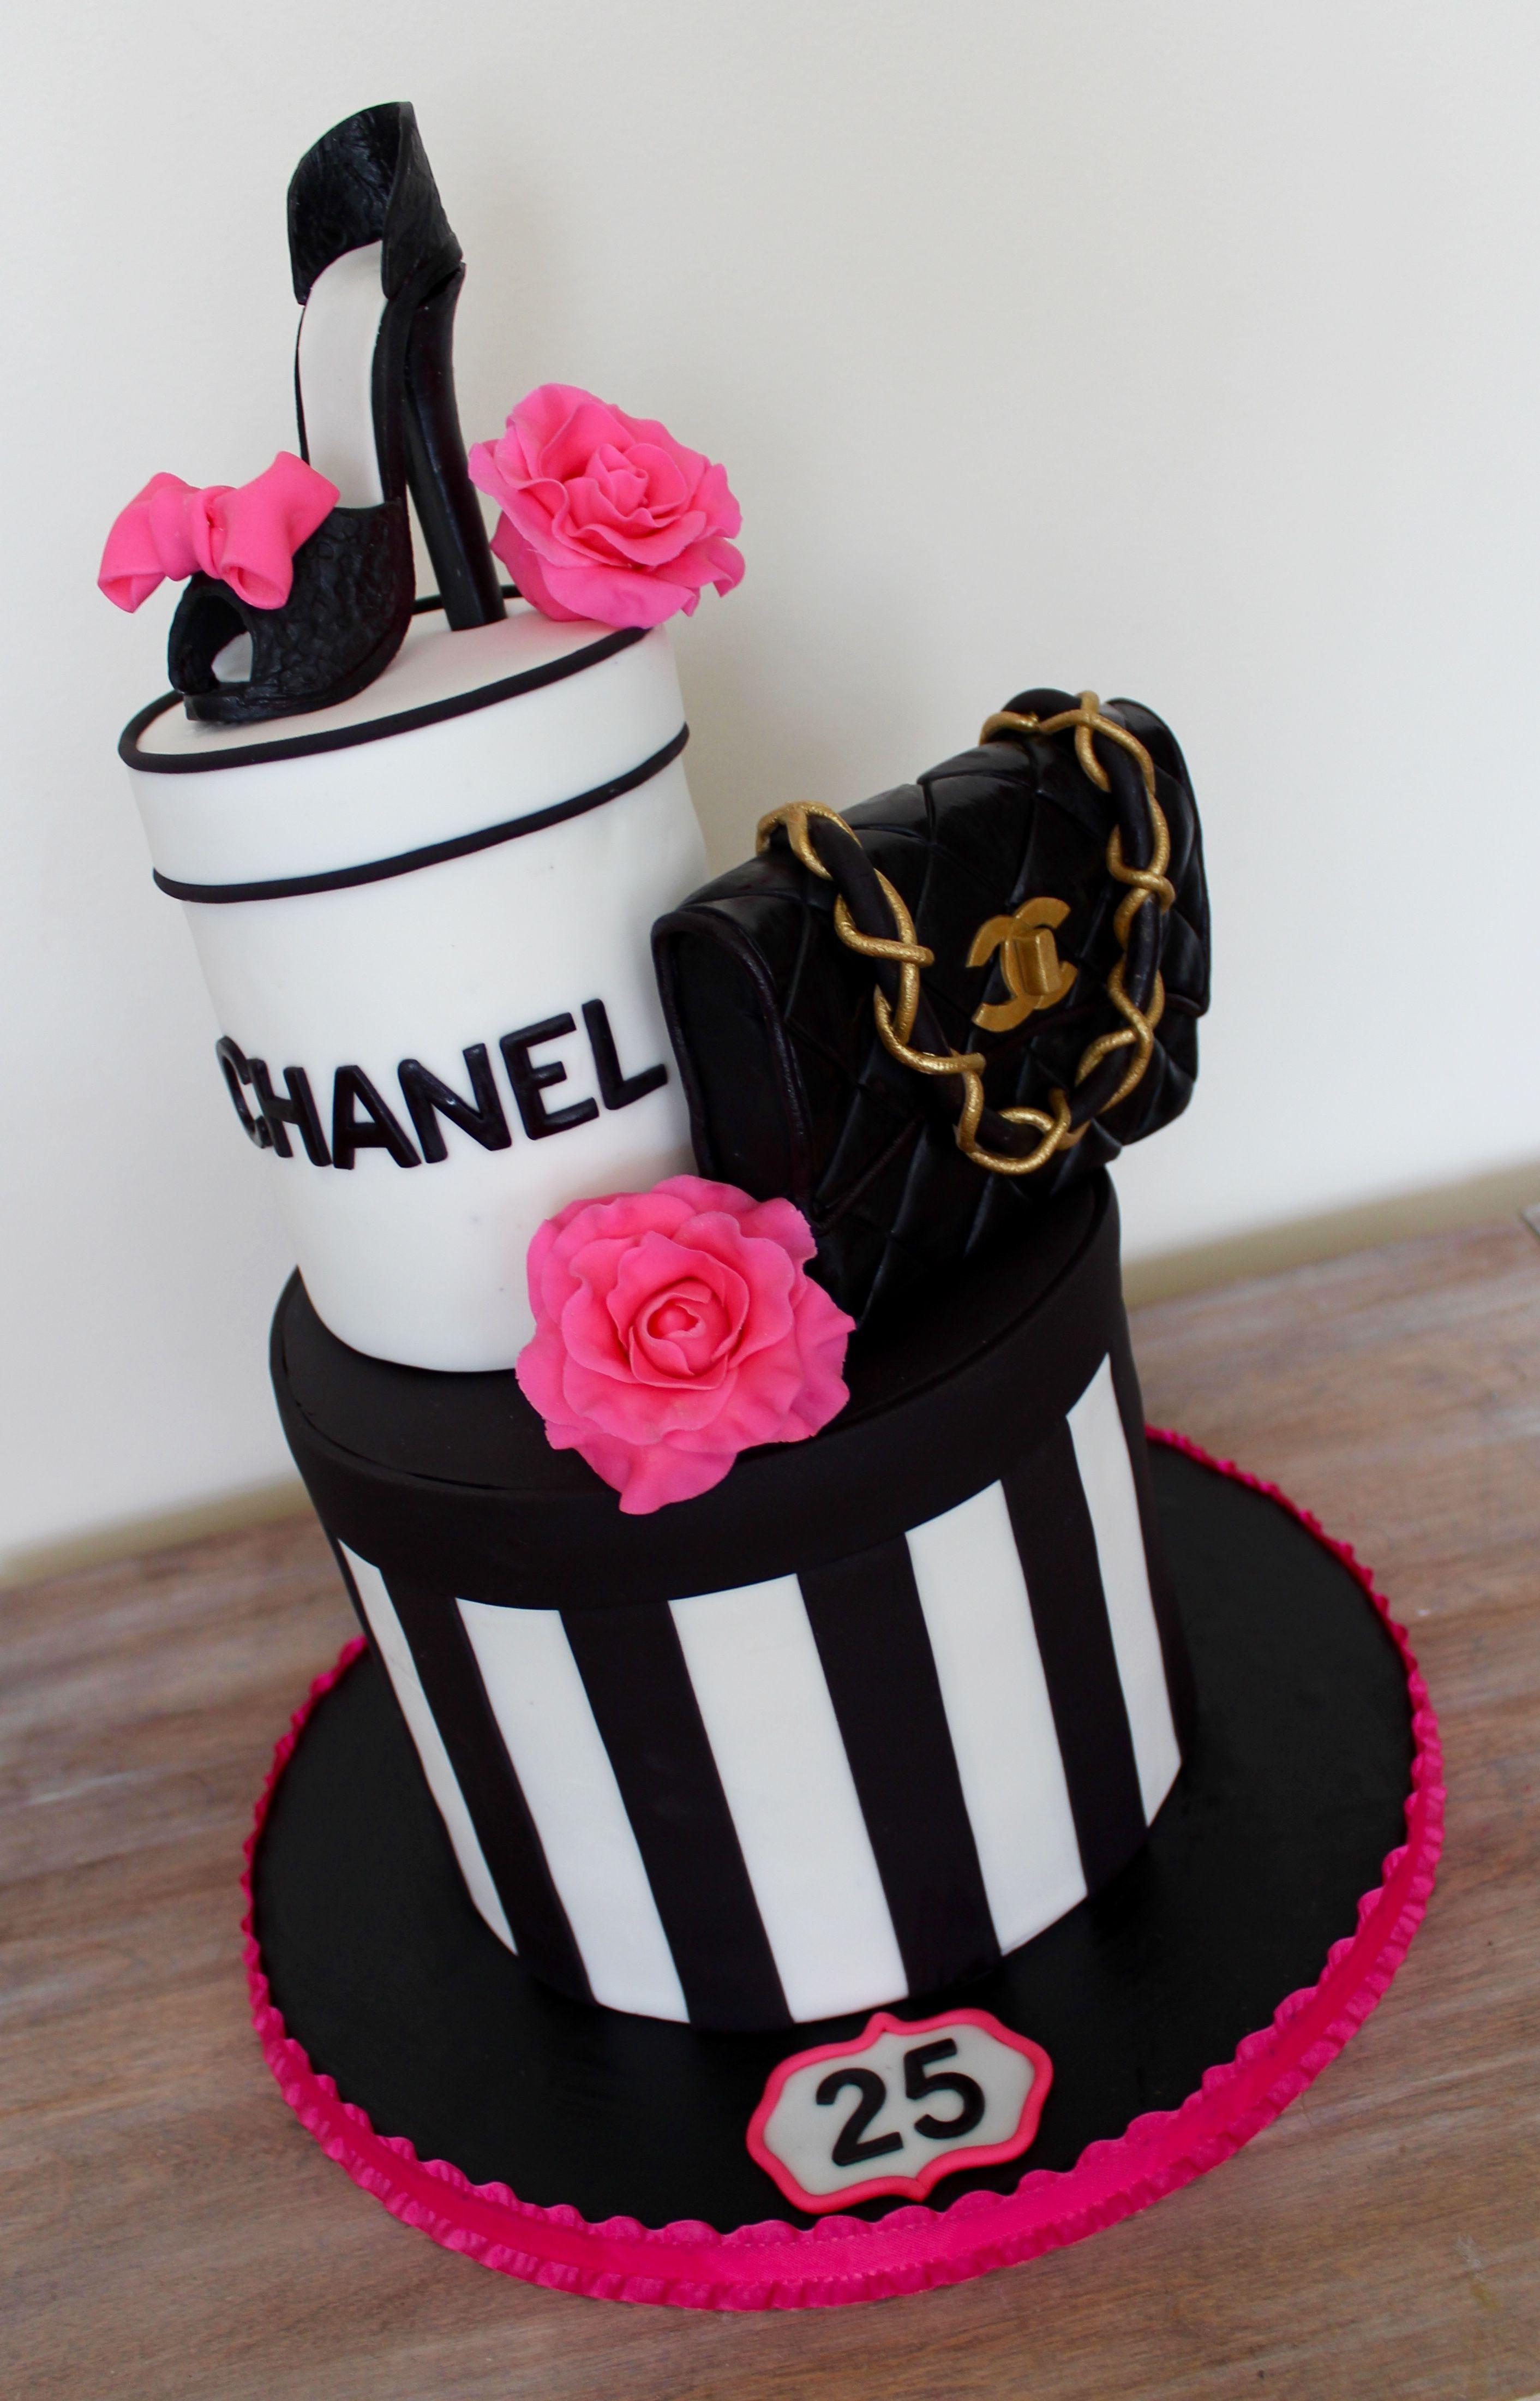 Chanel birthday cake with high heel 30ec284c4ac8e